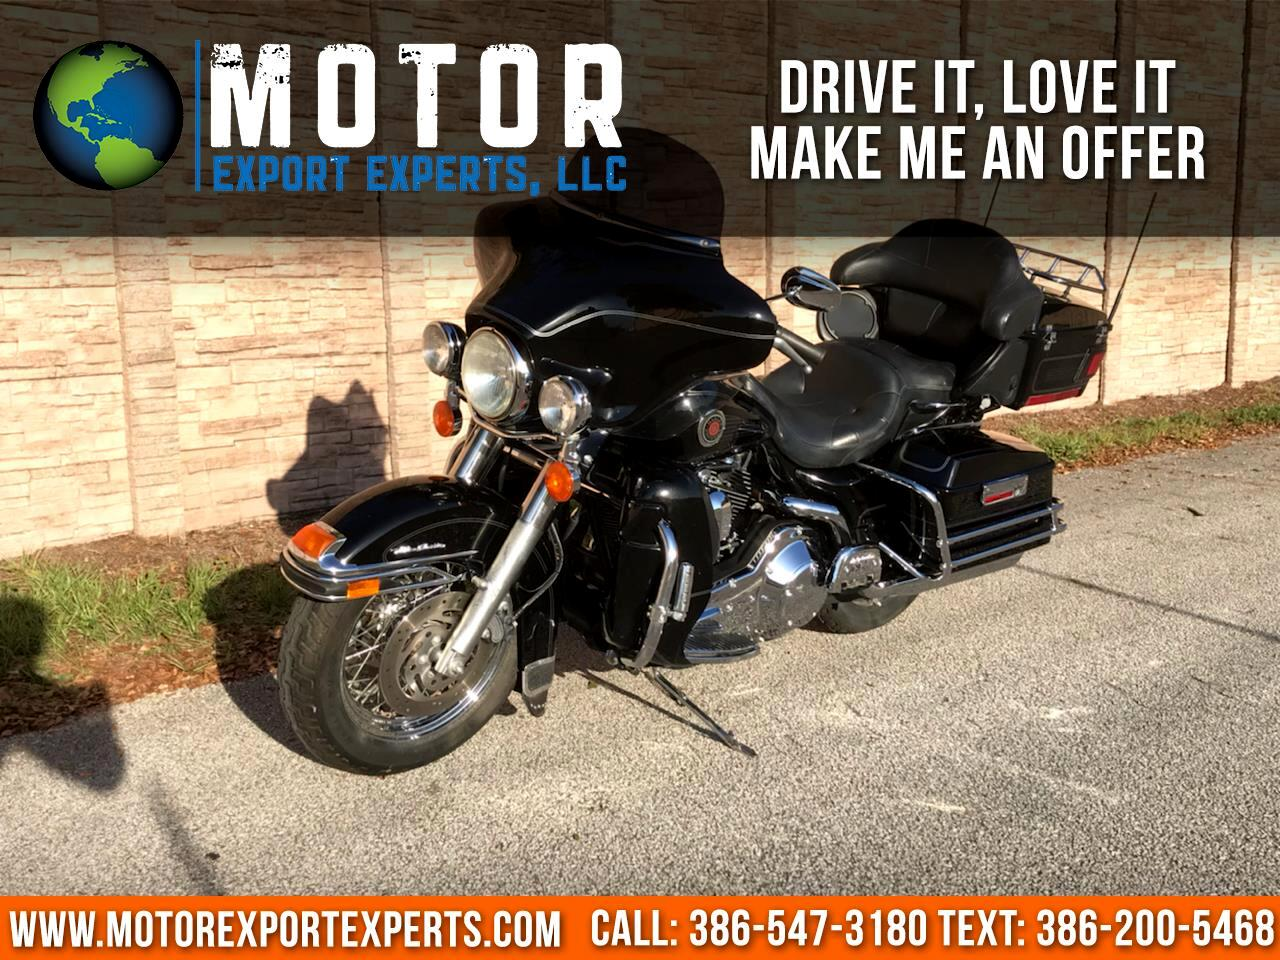 2004 Harley-Davidson FLHTCUI ULTRA CLASSIC